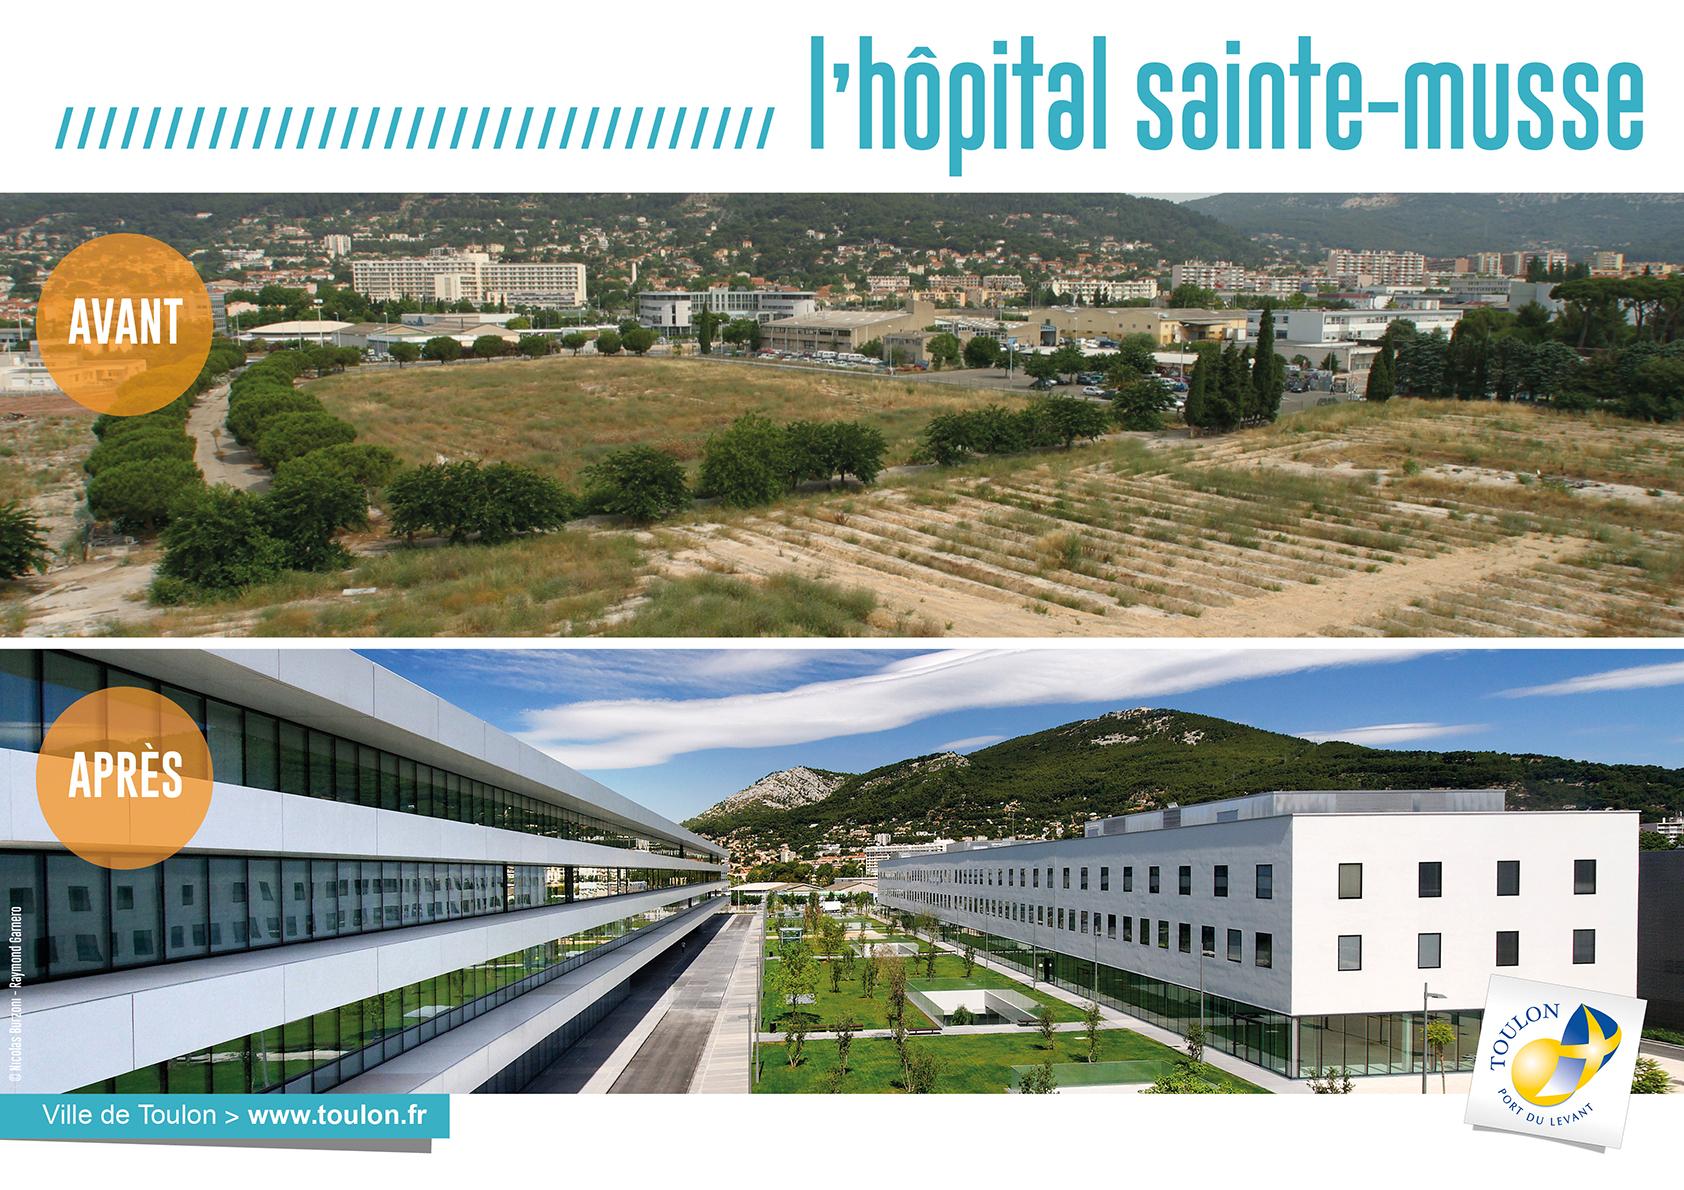 Hôpital Sainte-Musse